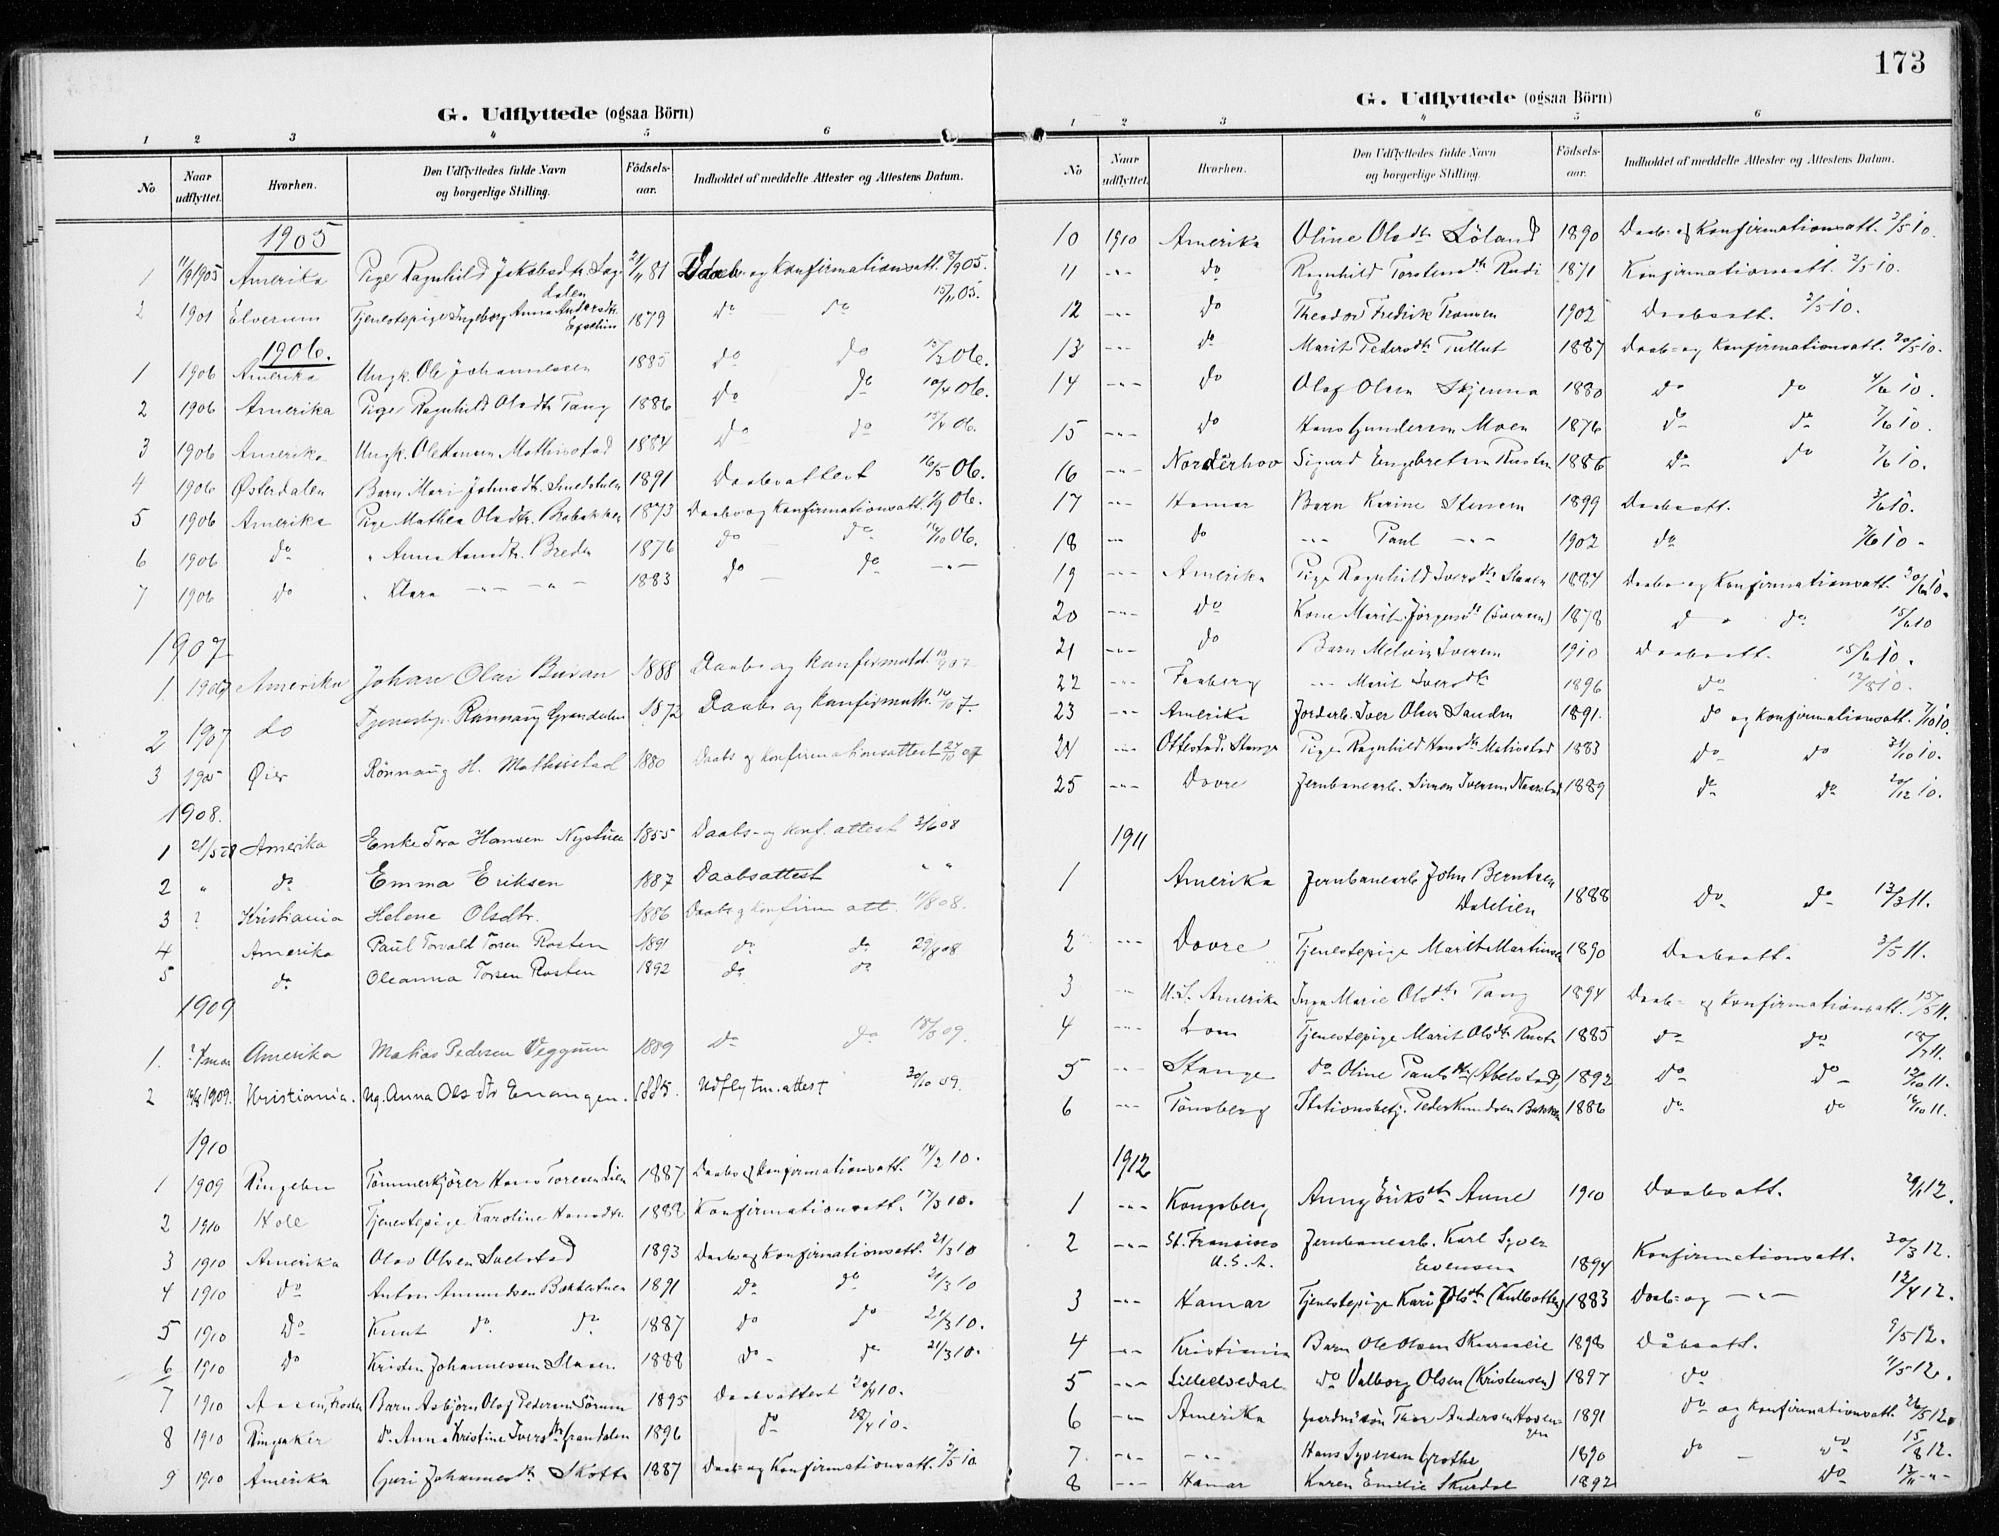 SAH, Sel prestekontor, Ministerialbok nr. 2, 1905-1919, s. 173